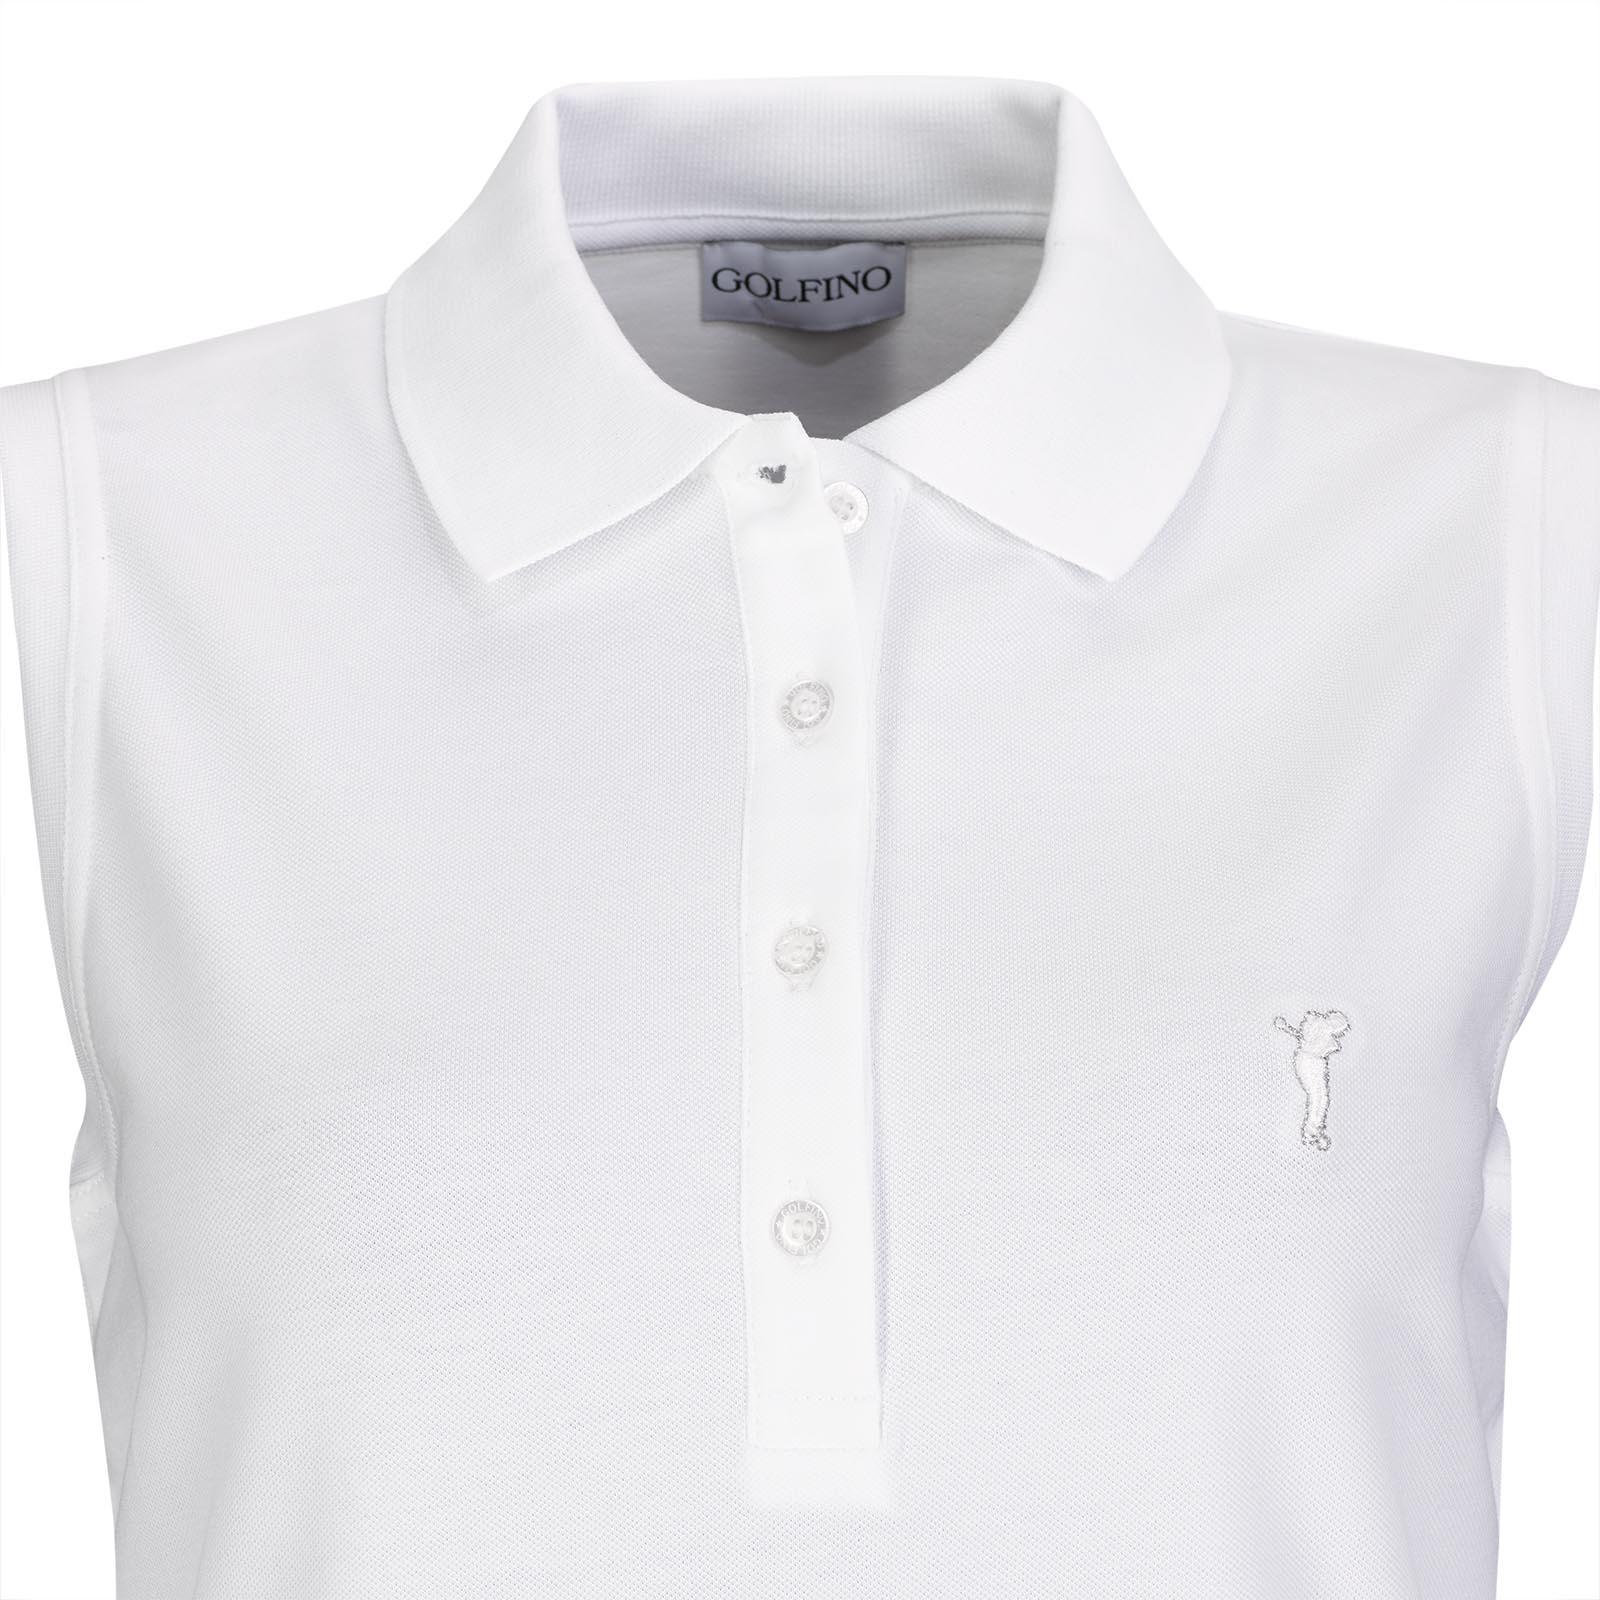 Ärmelloses Basic Cotton Blend Damen Golfpolo mit Stretchfunktion